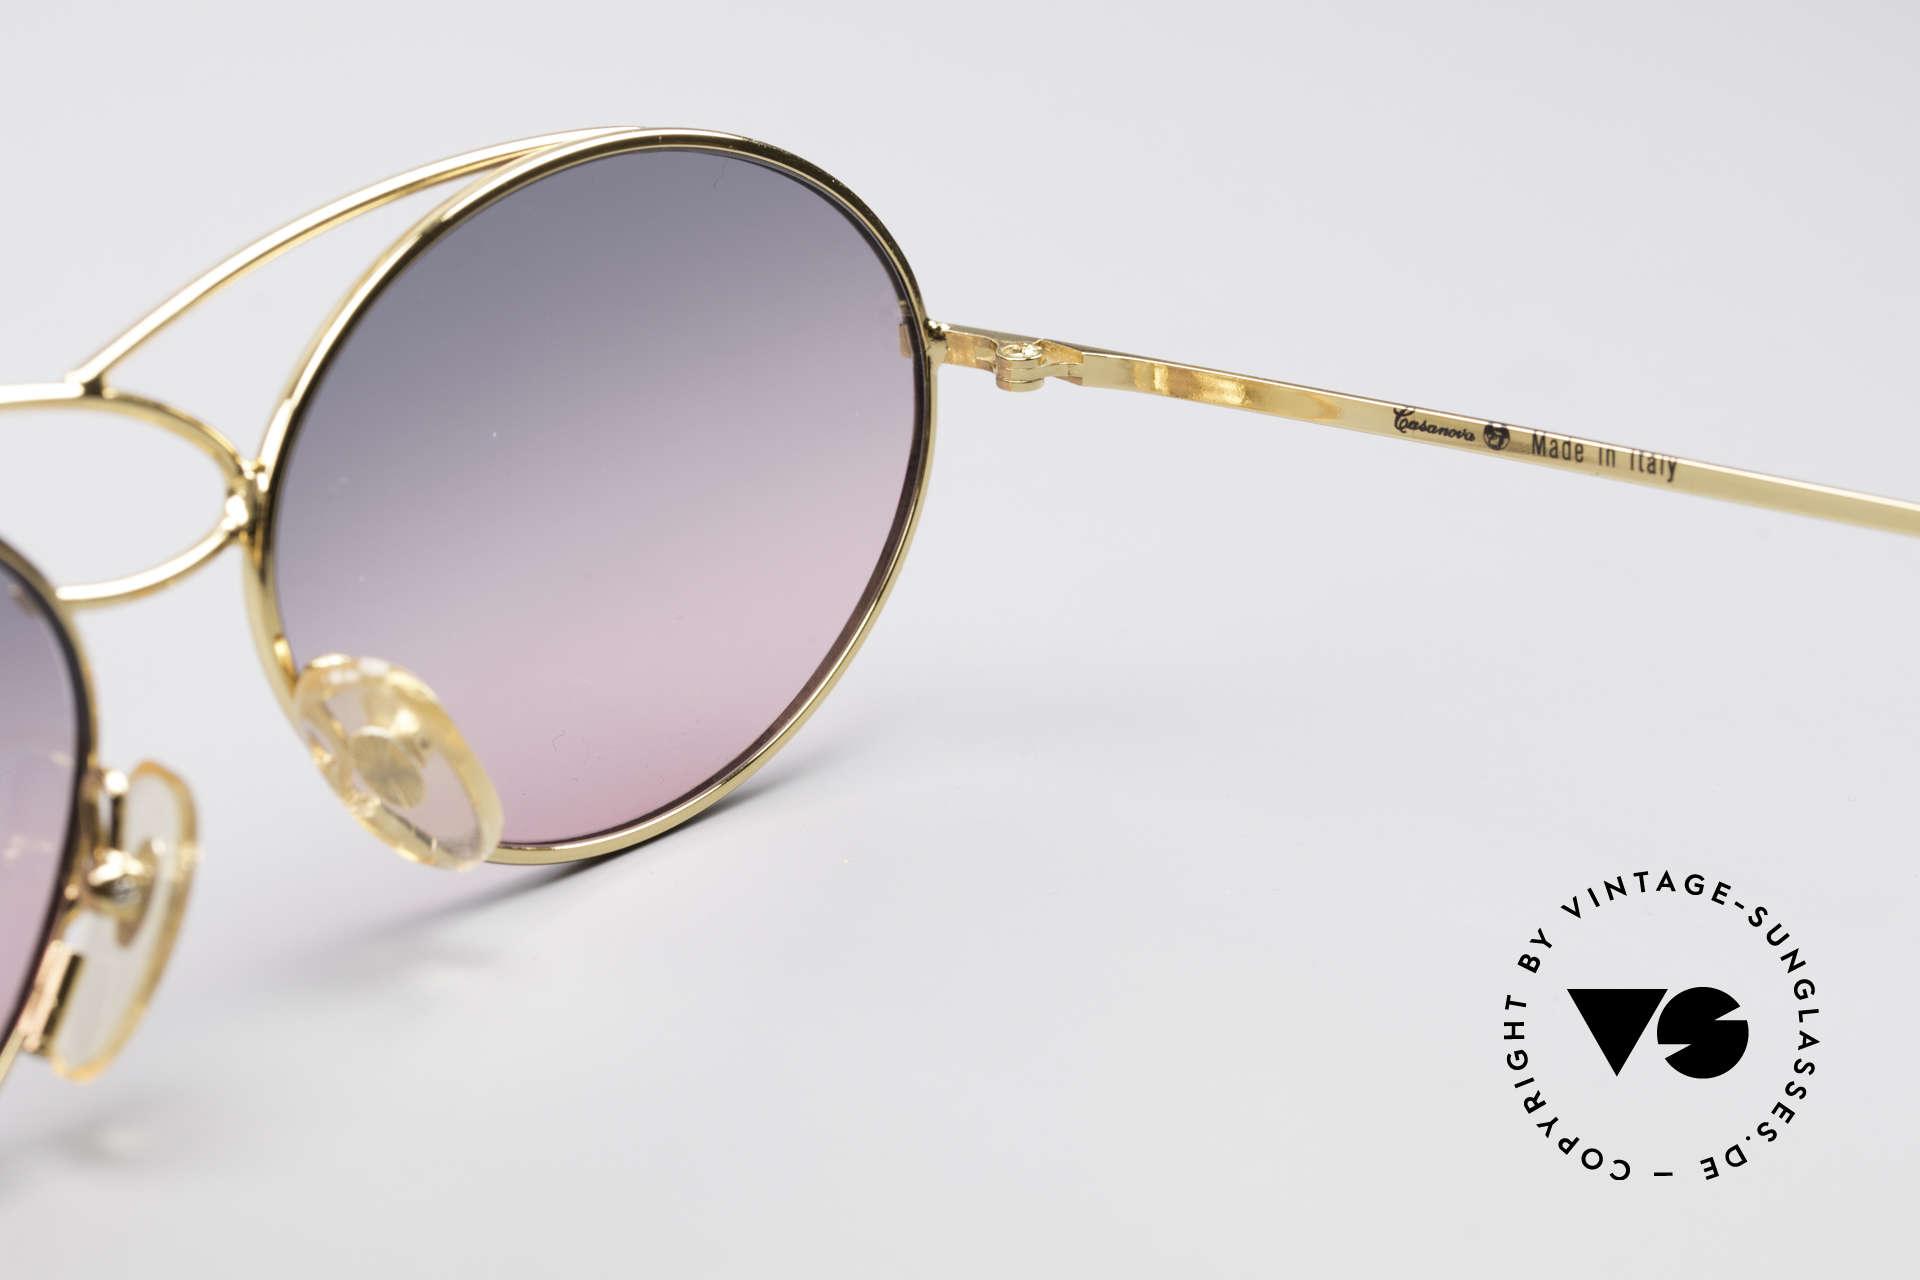 Casanova LC17 Vintage Ladies Sunglasses, NO retro shades, but a unique old designer ORIGINAL, Made for Women